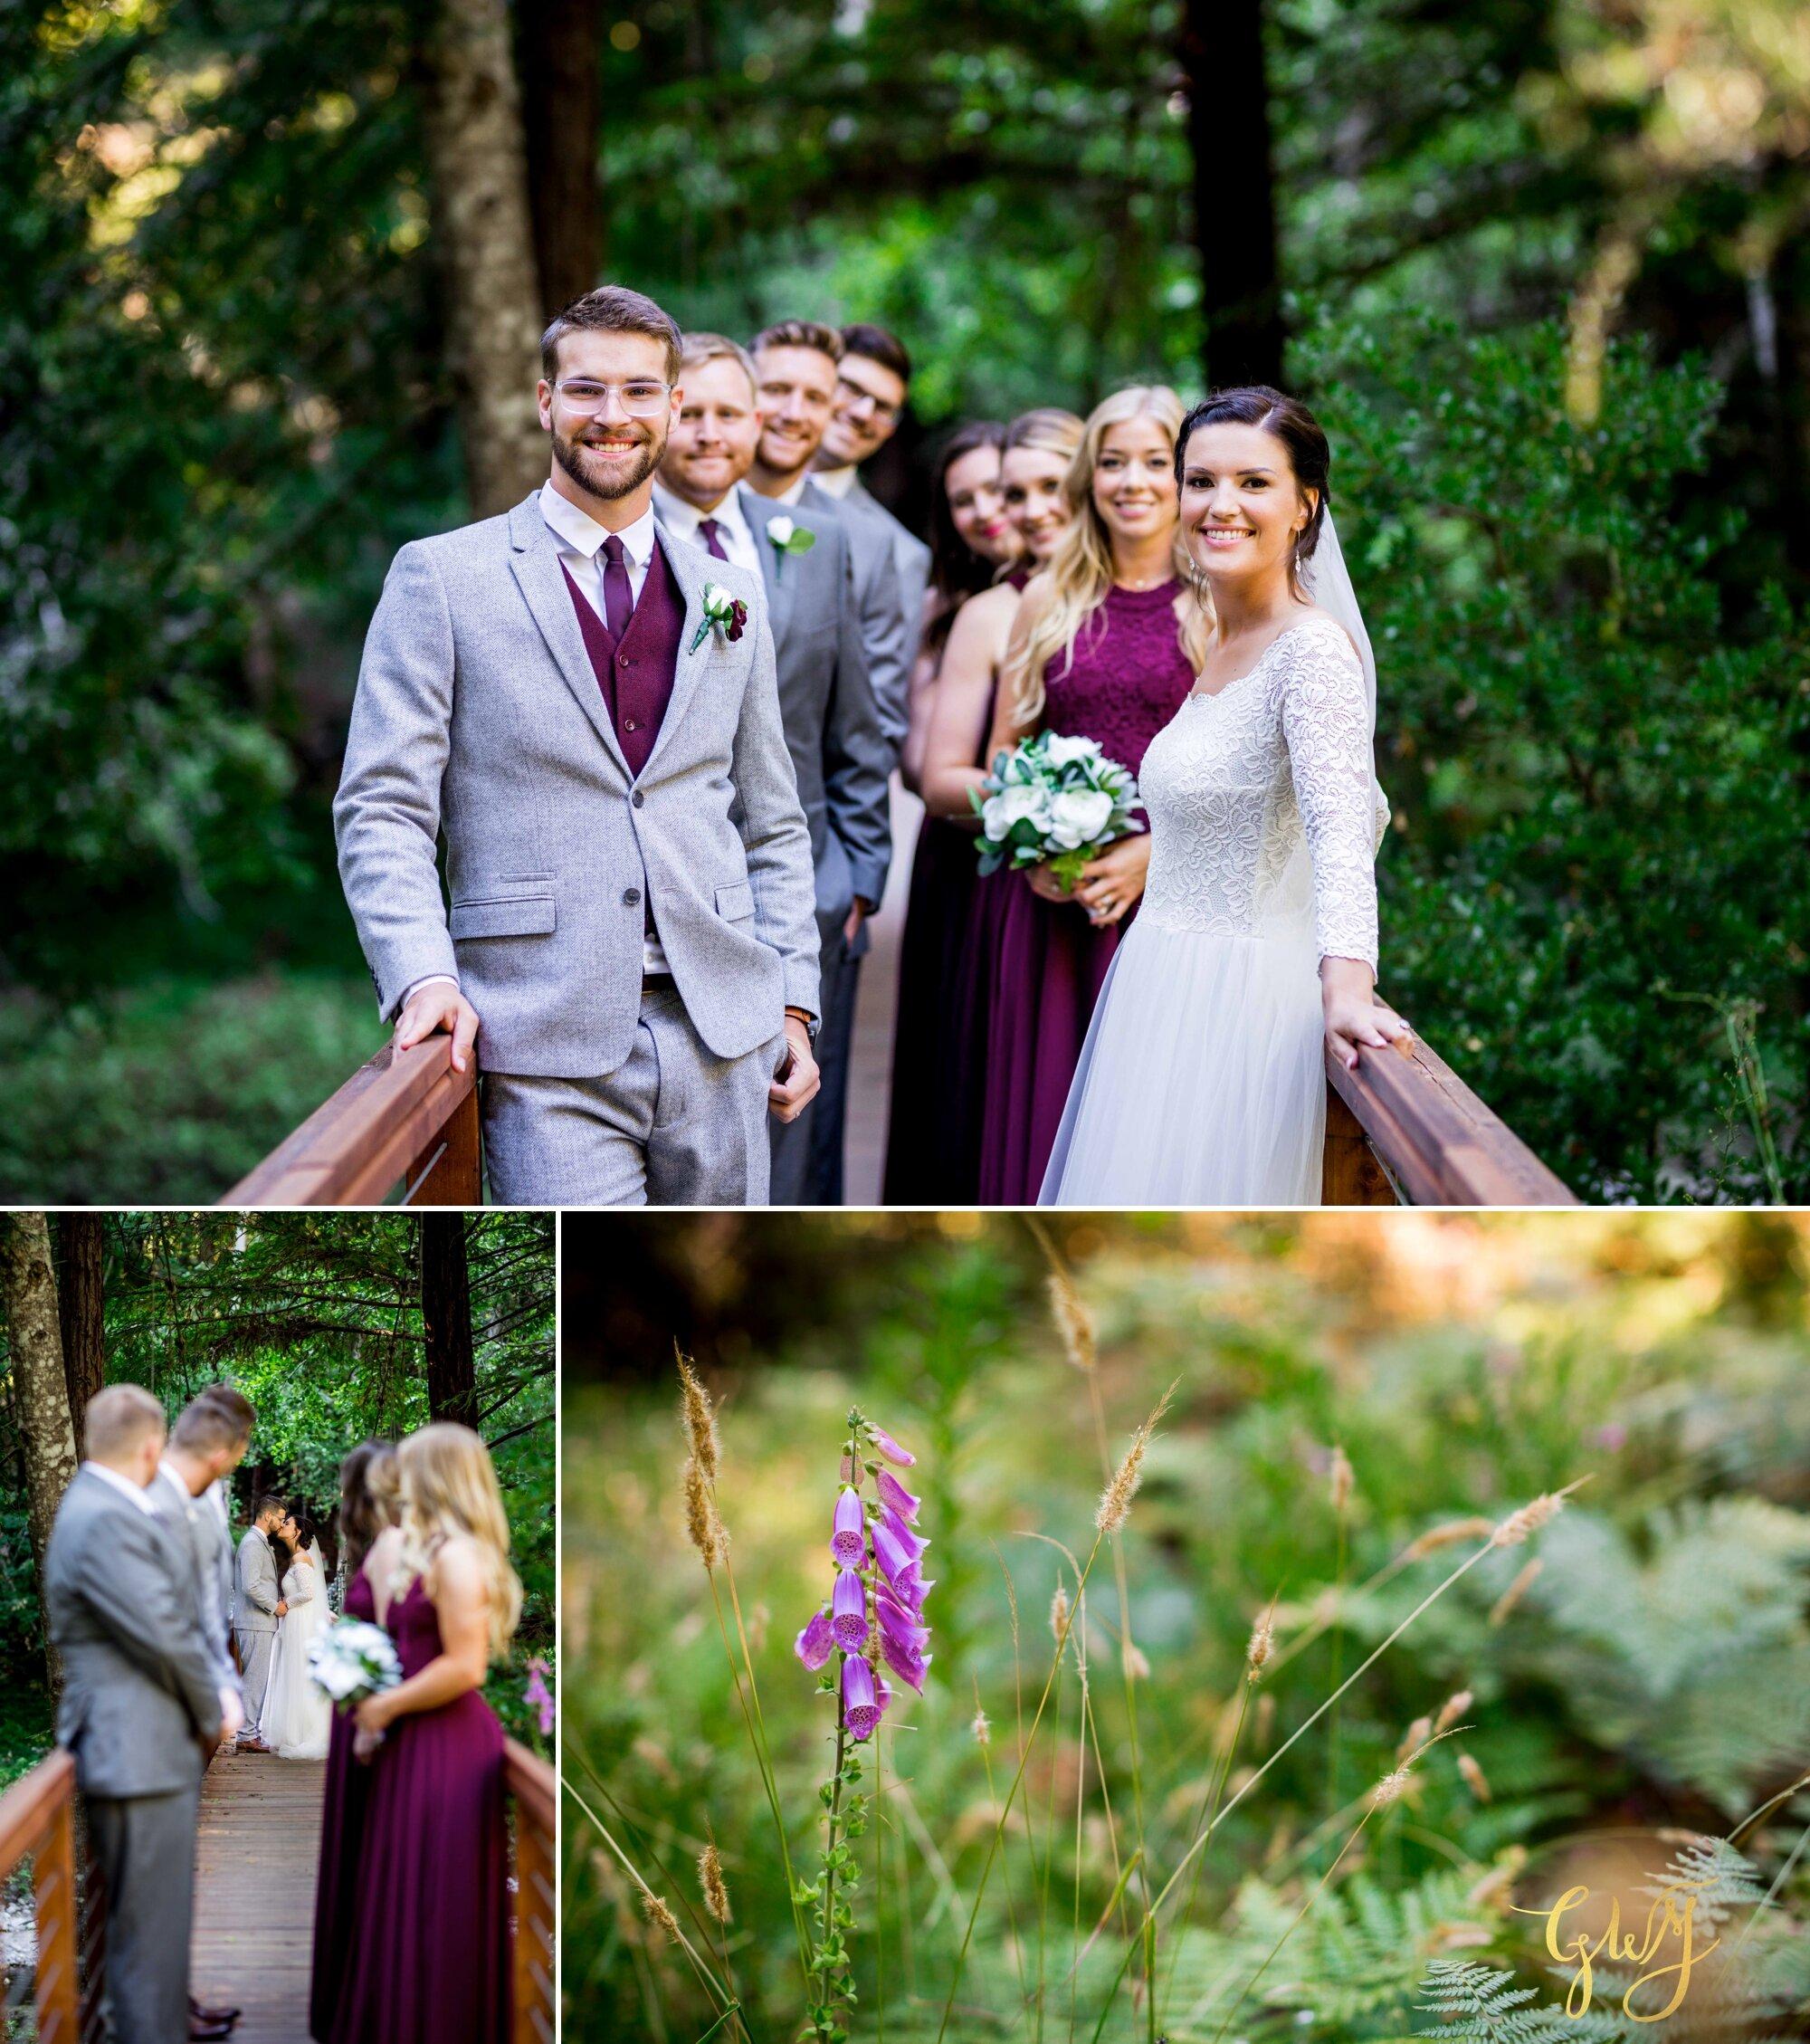 Casey + Jordan's Intimate Big Sur Elopement in the Redwoods by Glass Woods Media - 2 2.jpg